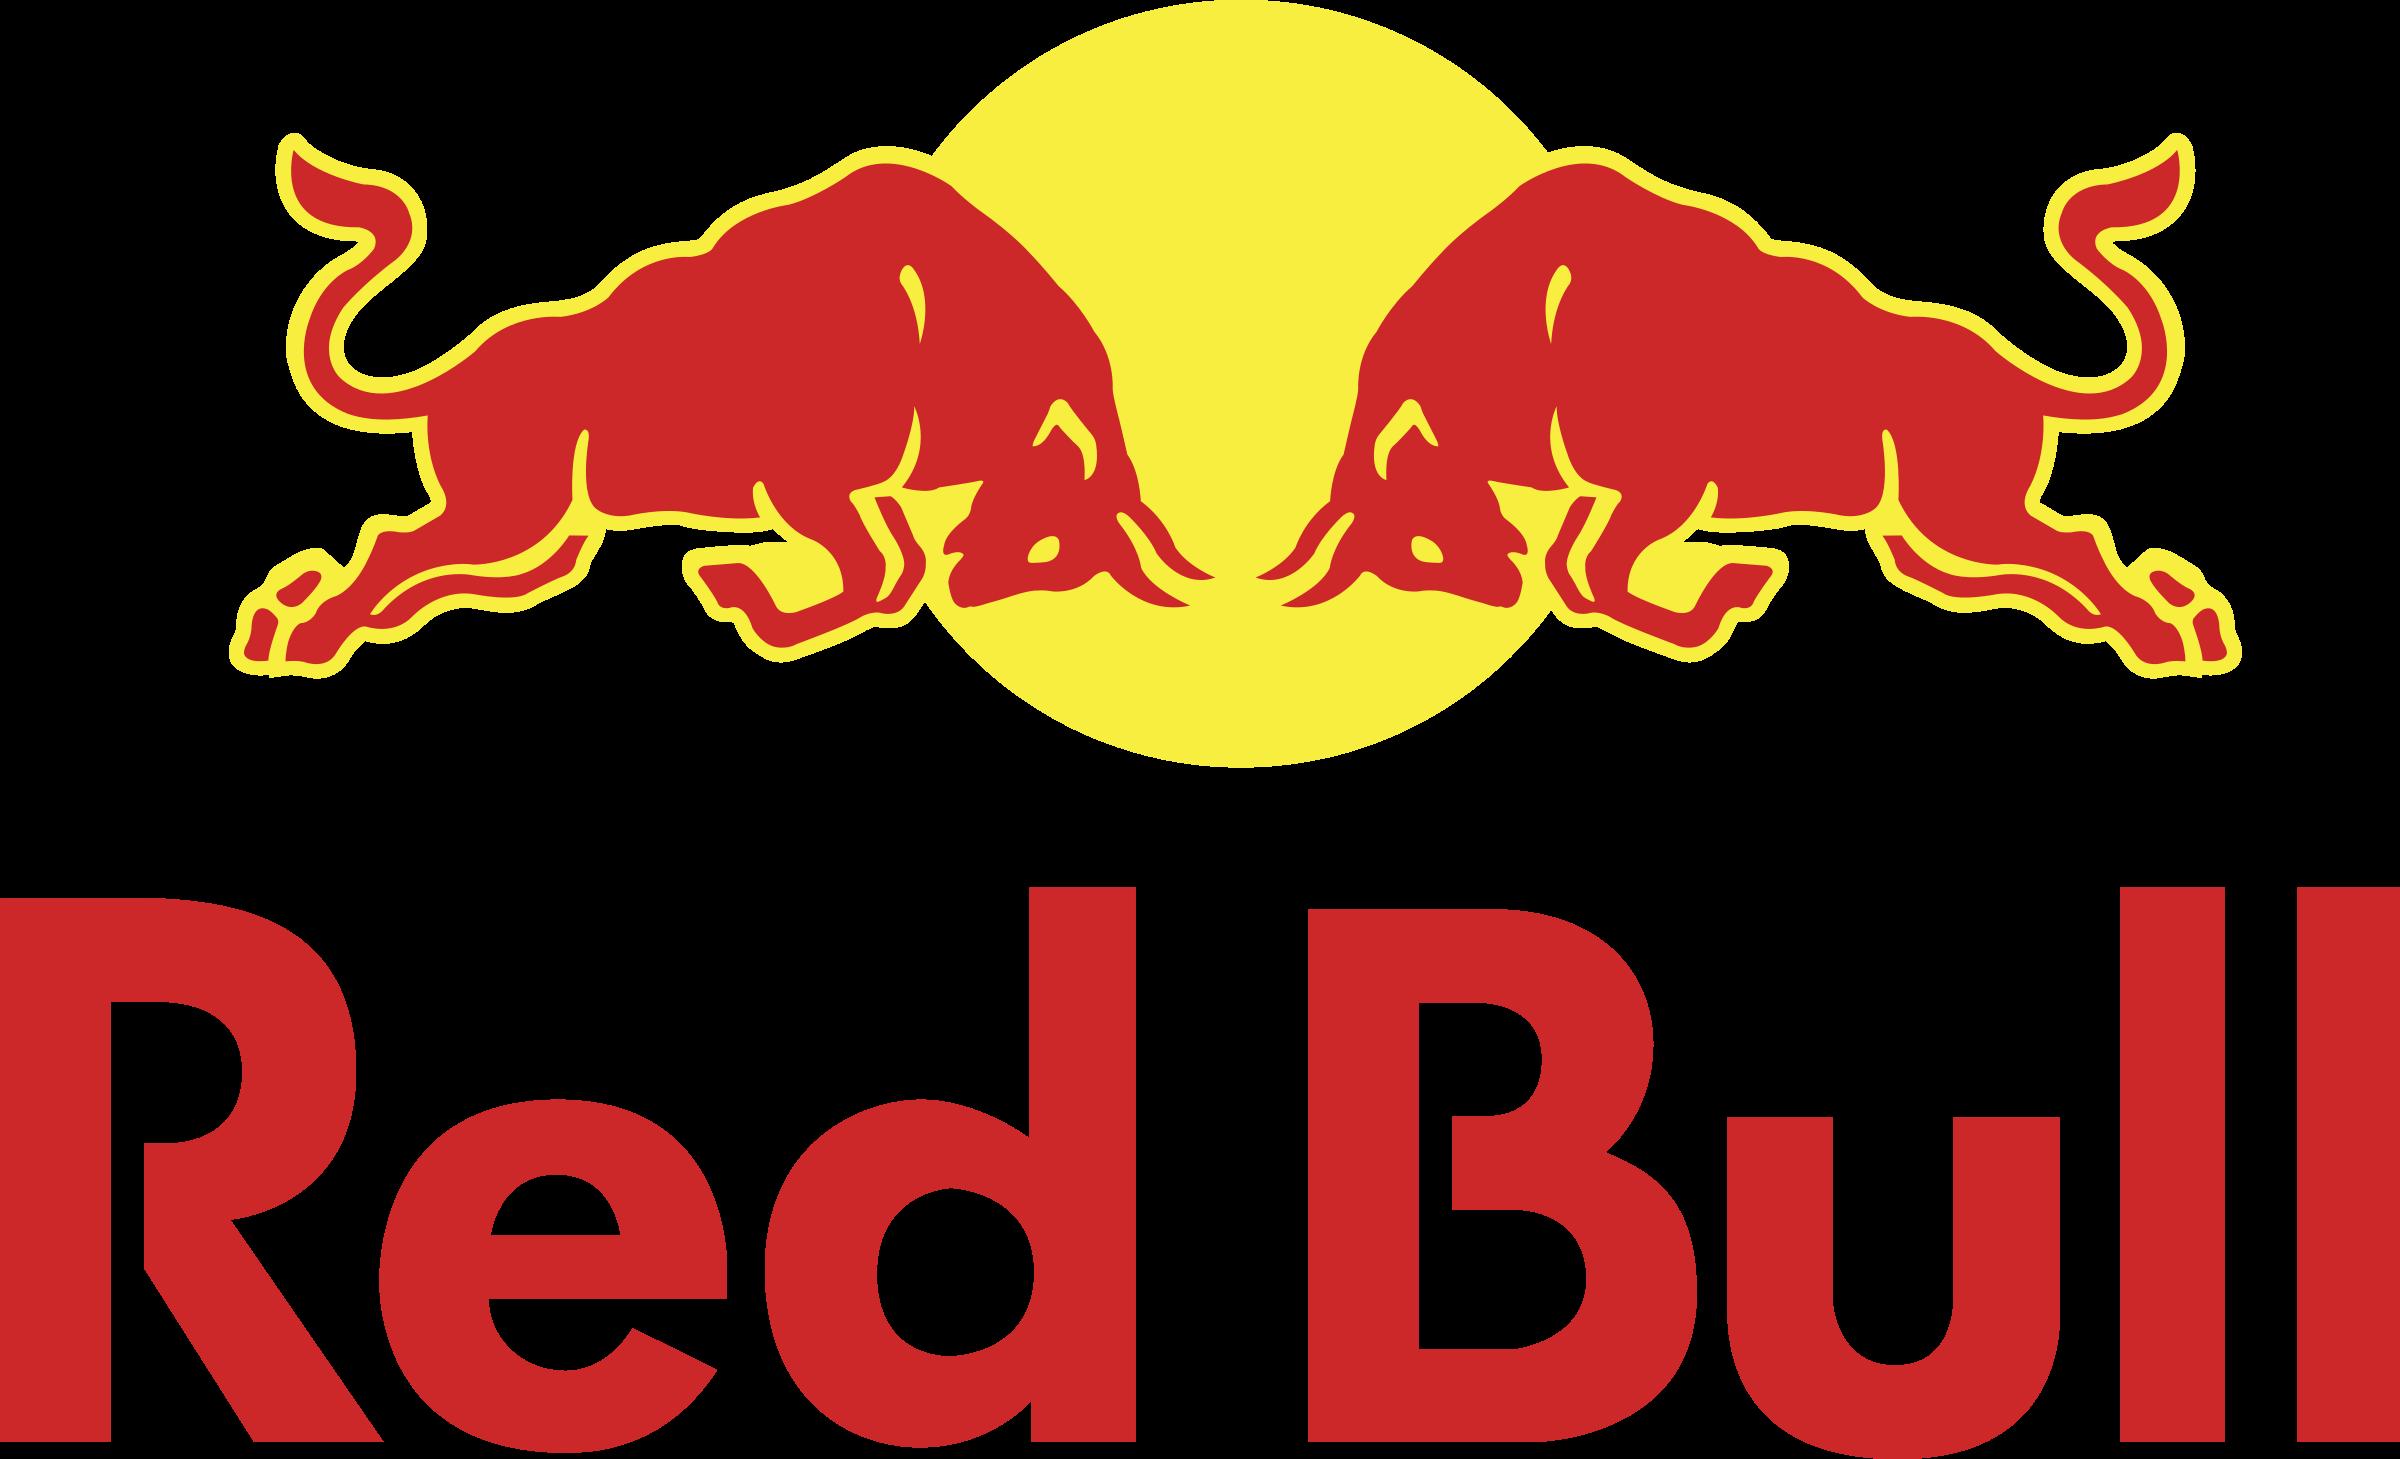 Customer Logo #2 of Fifty